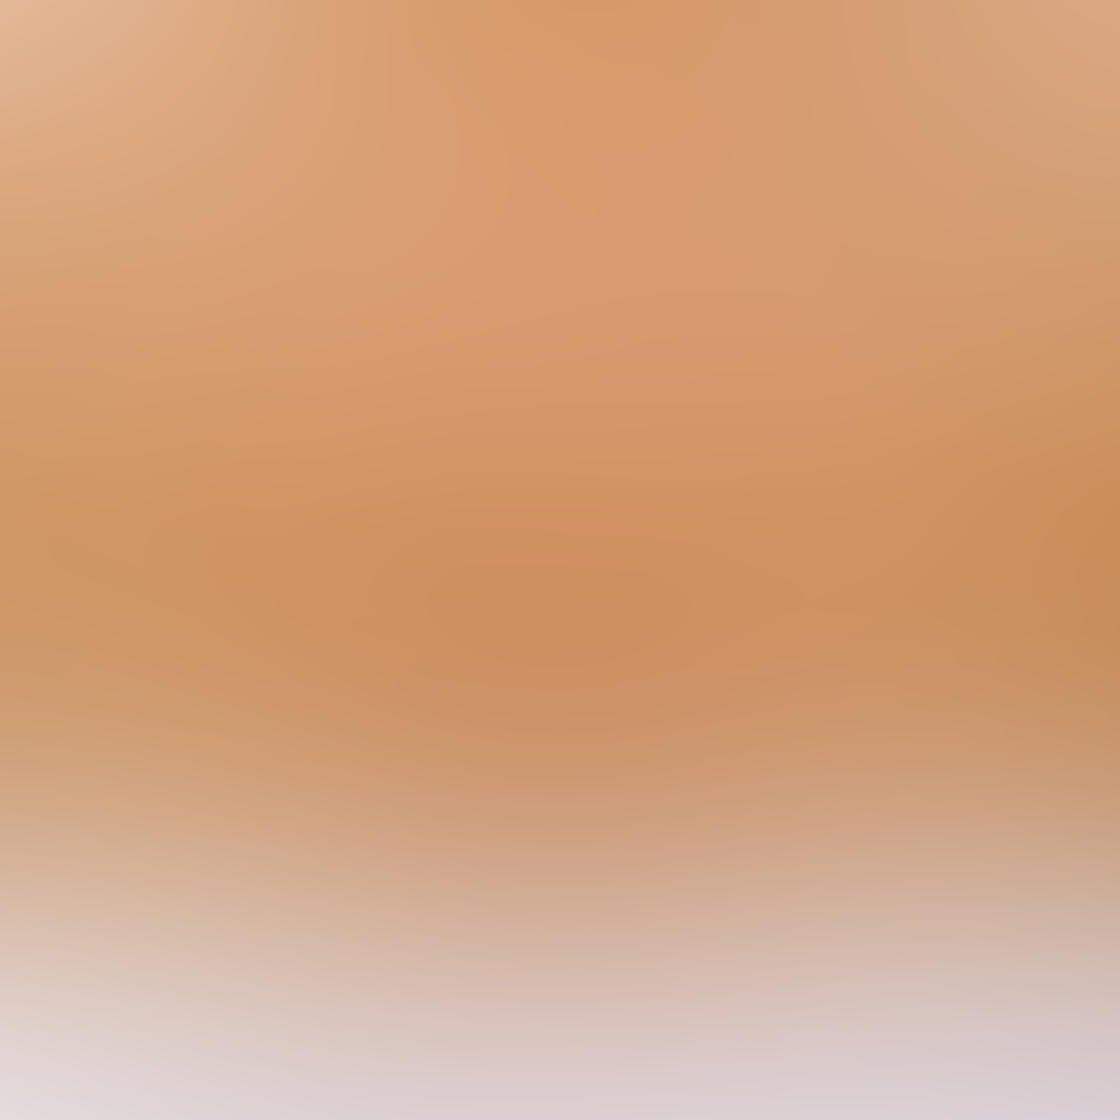 Ordinary iPhone Photo Subjects 27